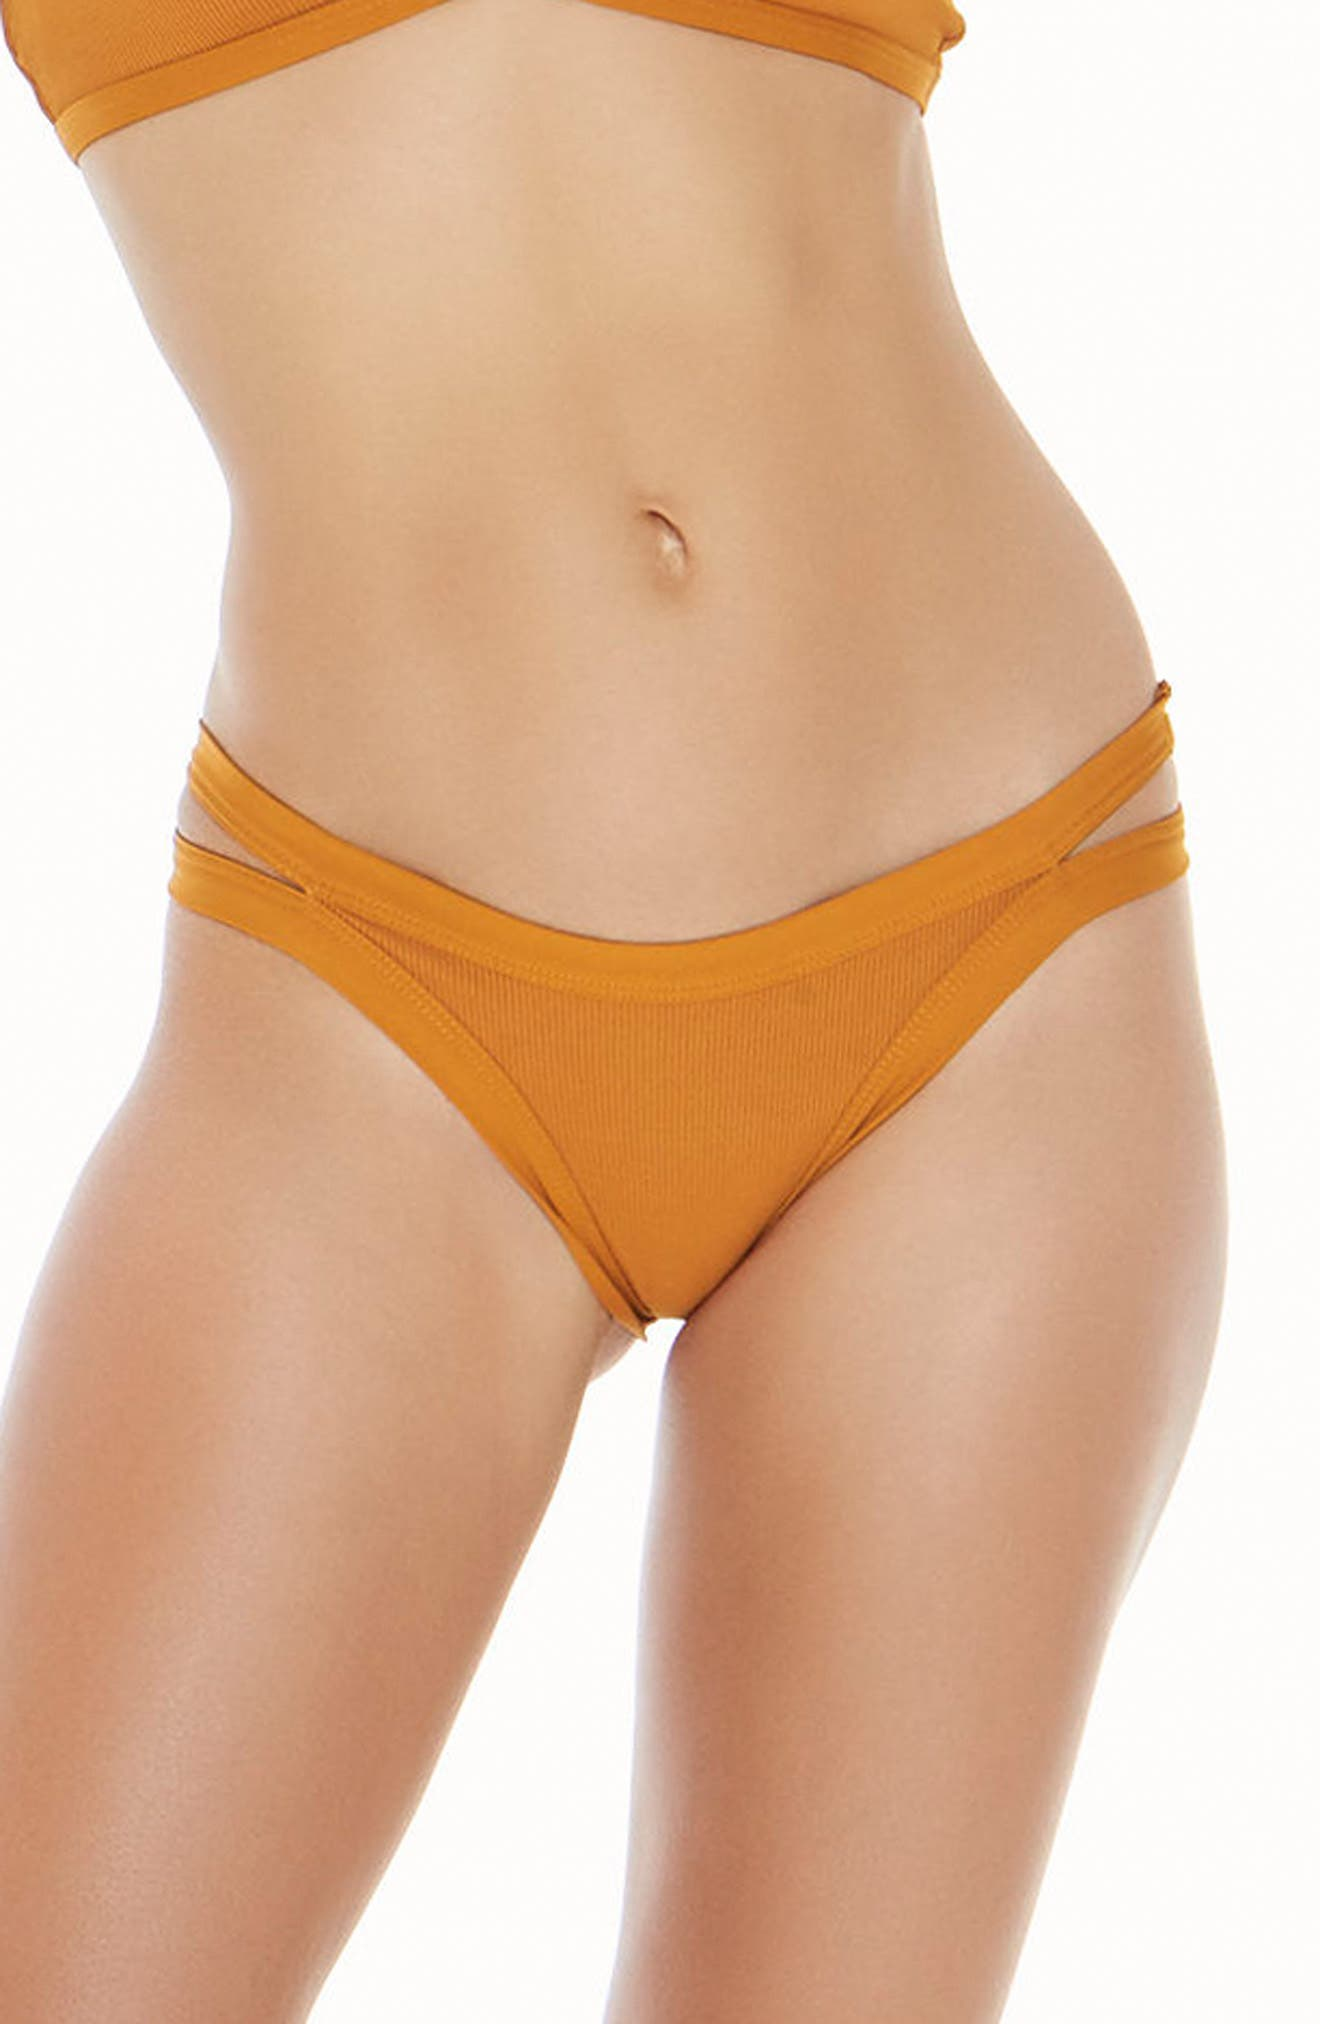 Ridin' High Charlie Classic Bikini Bottoms,                             Main thumbnail 1, color,                             Inka Gold